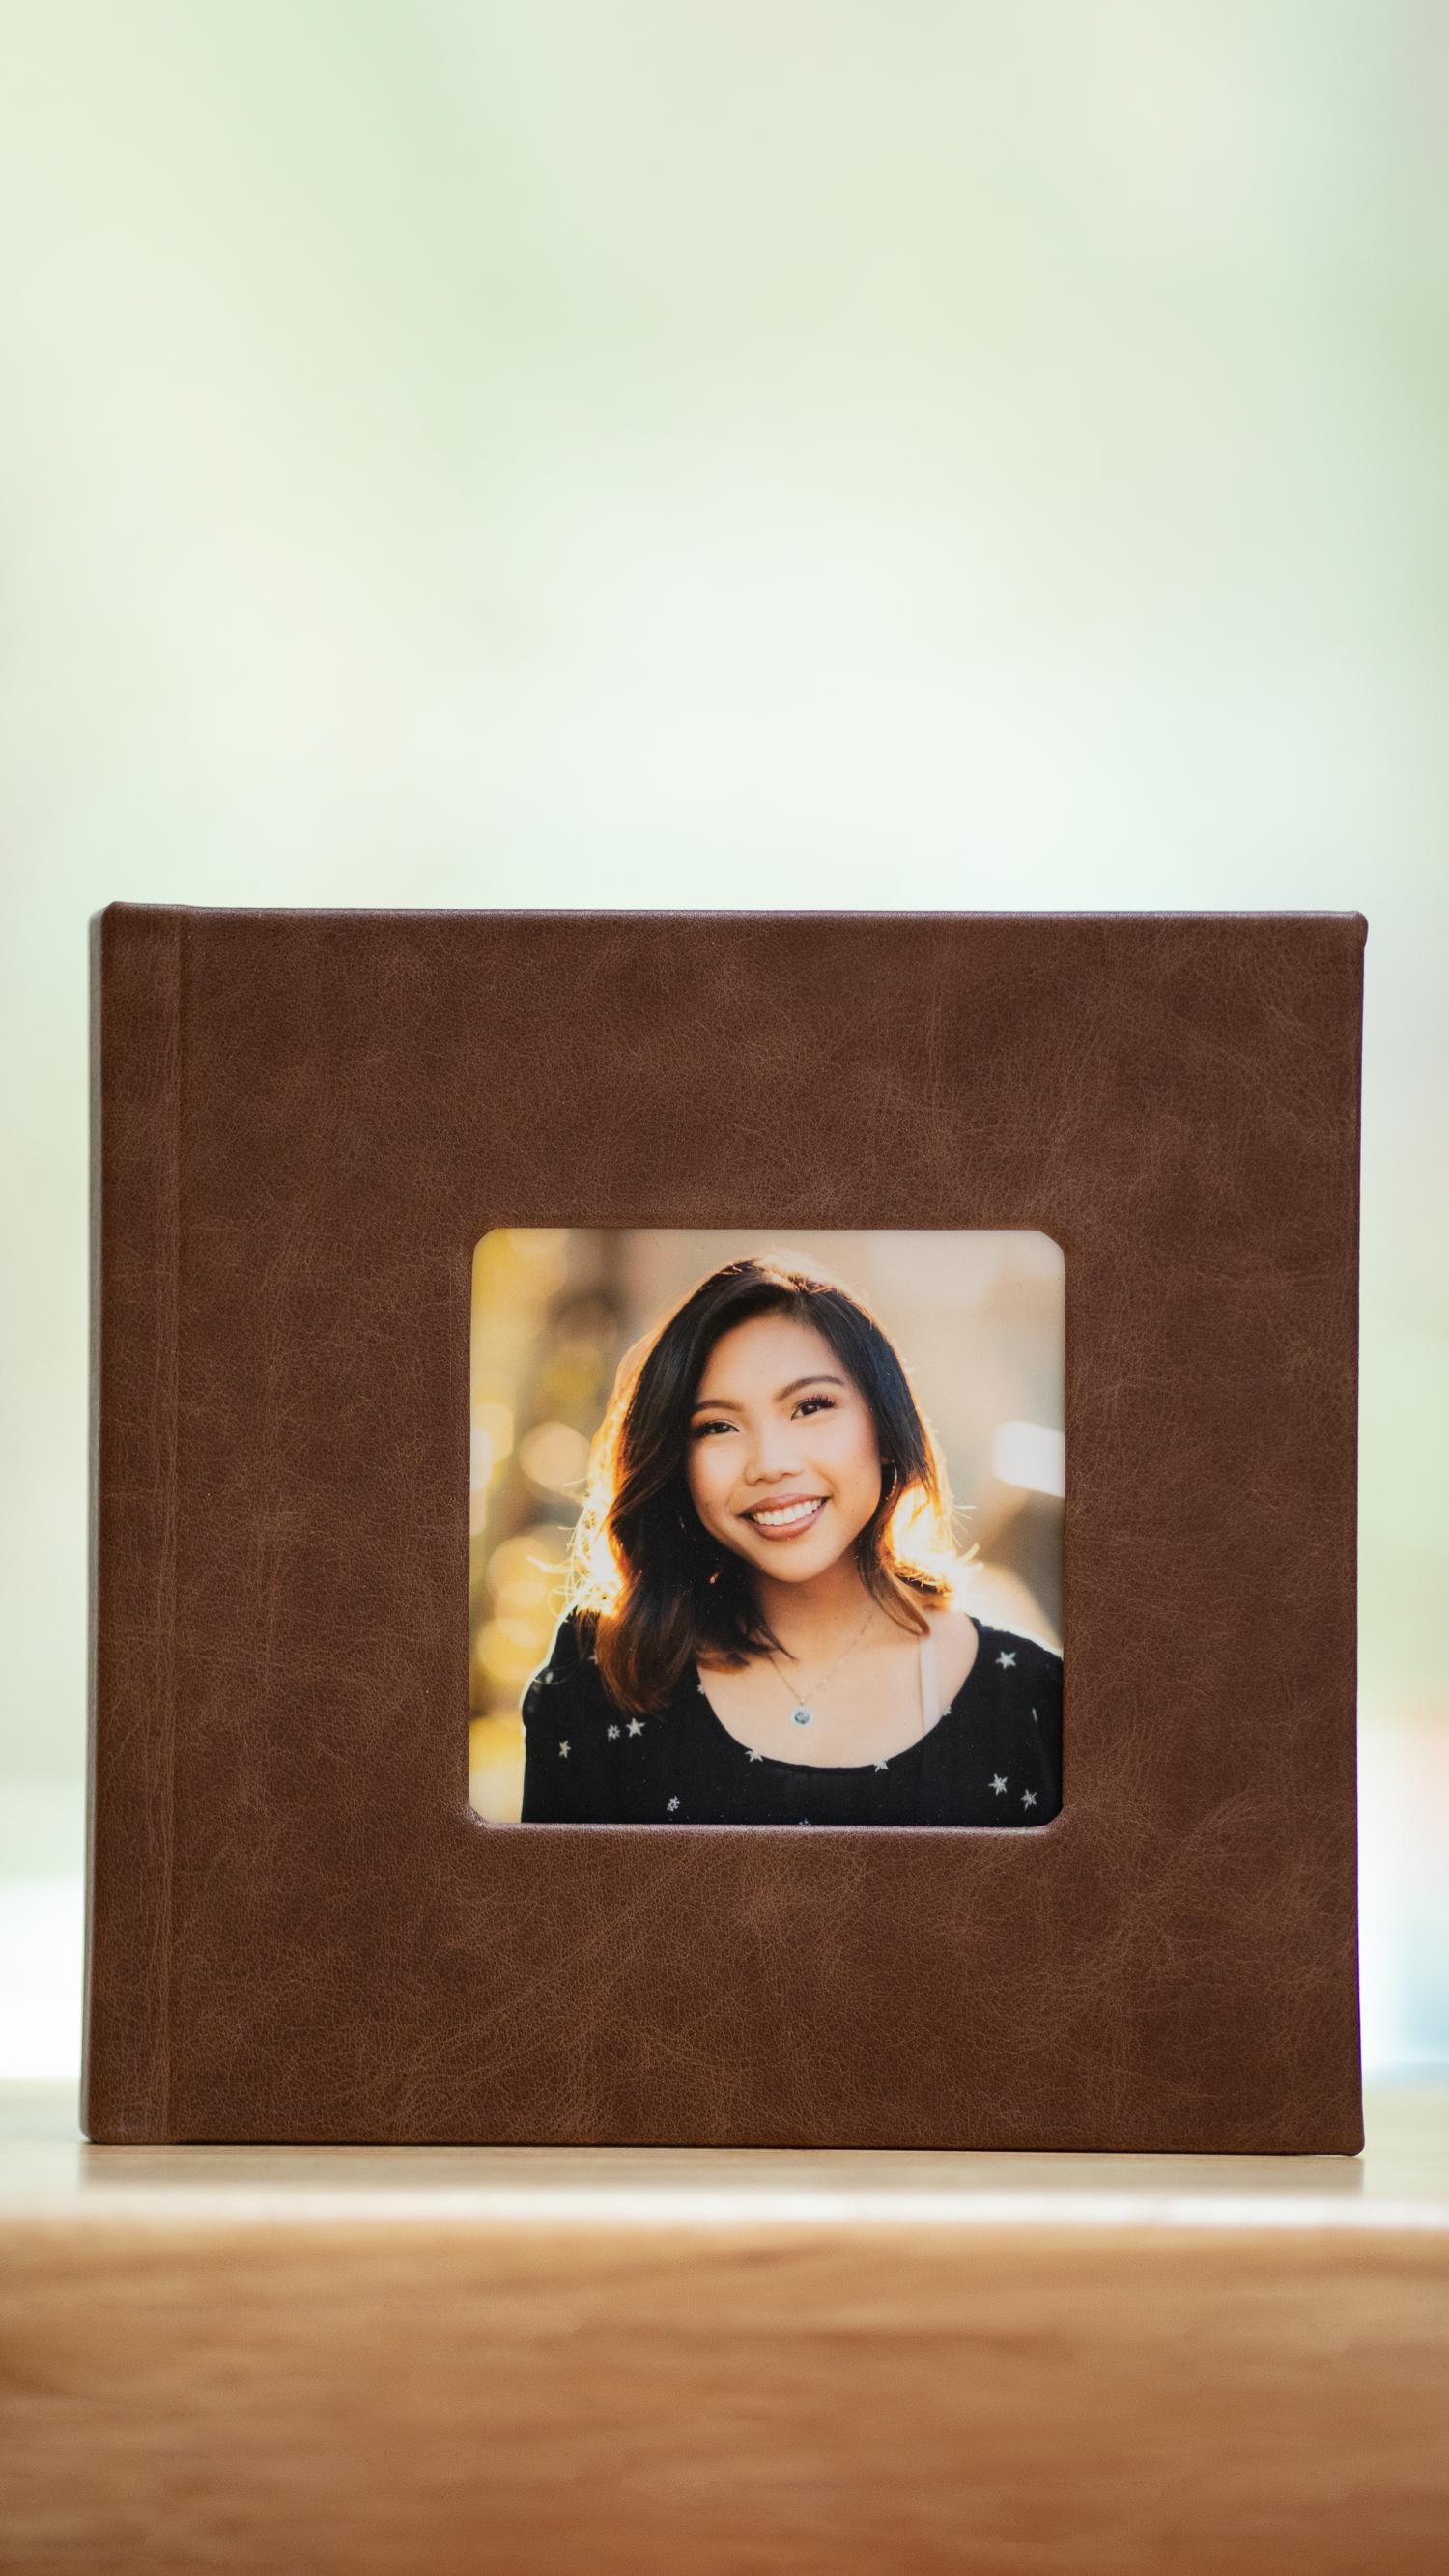 ariella-noelle-photography-seattle-area-senior-portraits-2.JPG